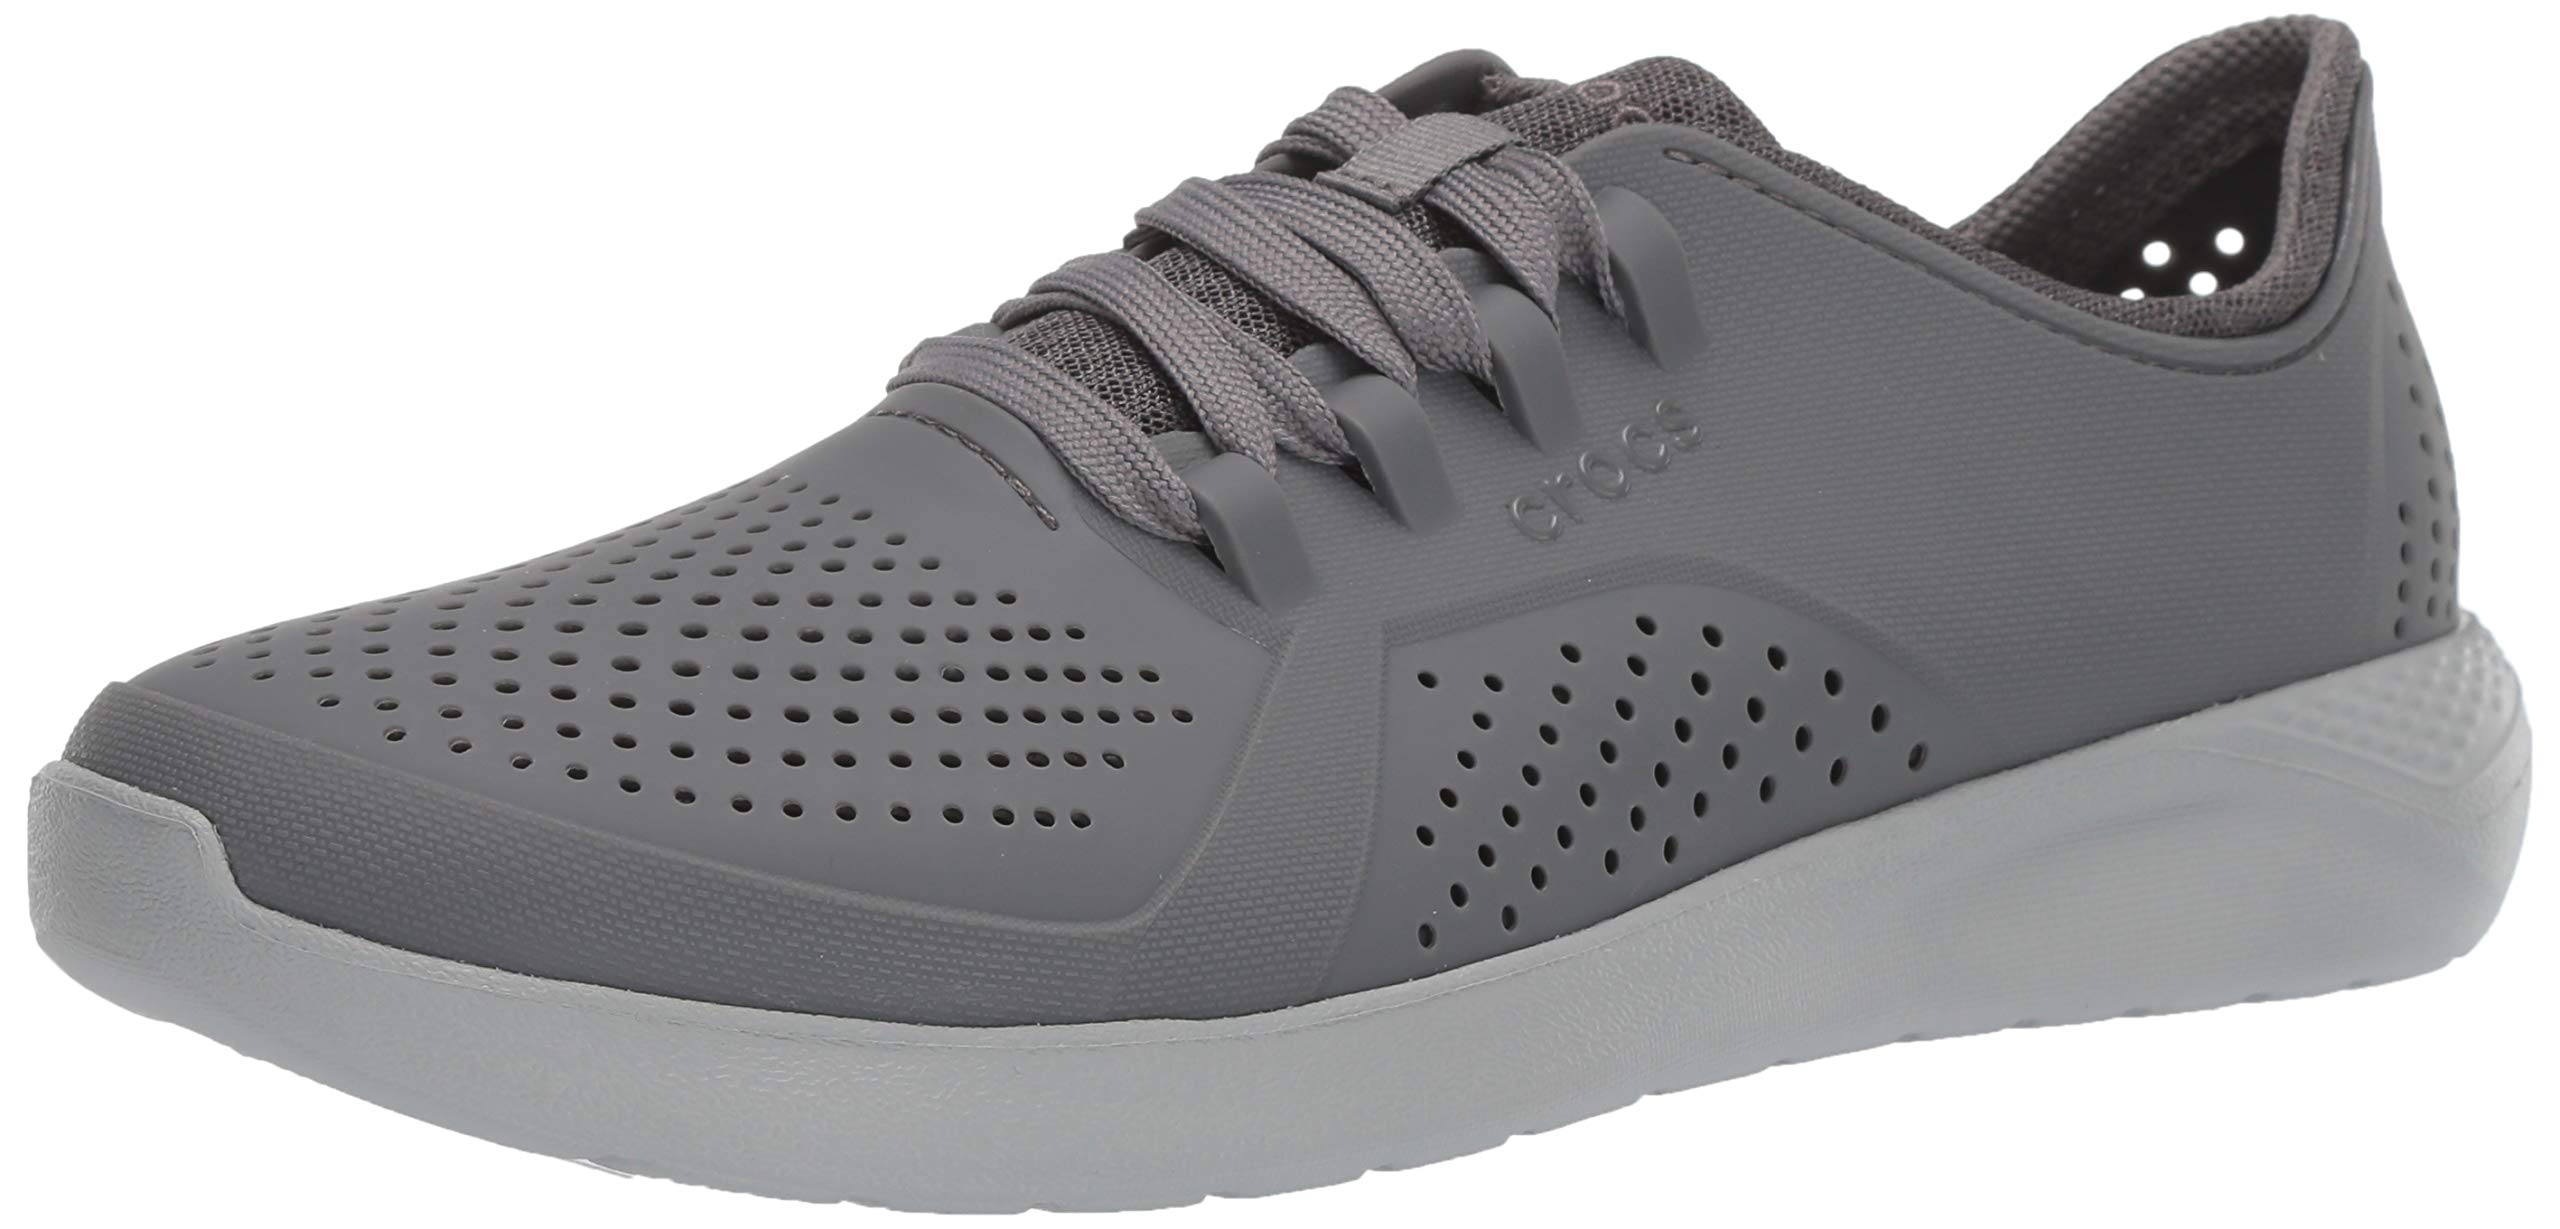 LiteRide Pacer Sneaker, Charcoal/Light